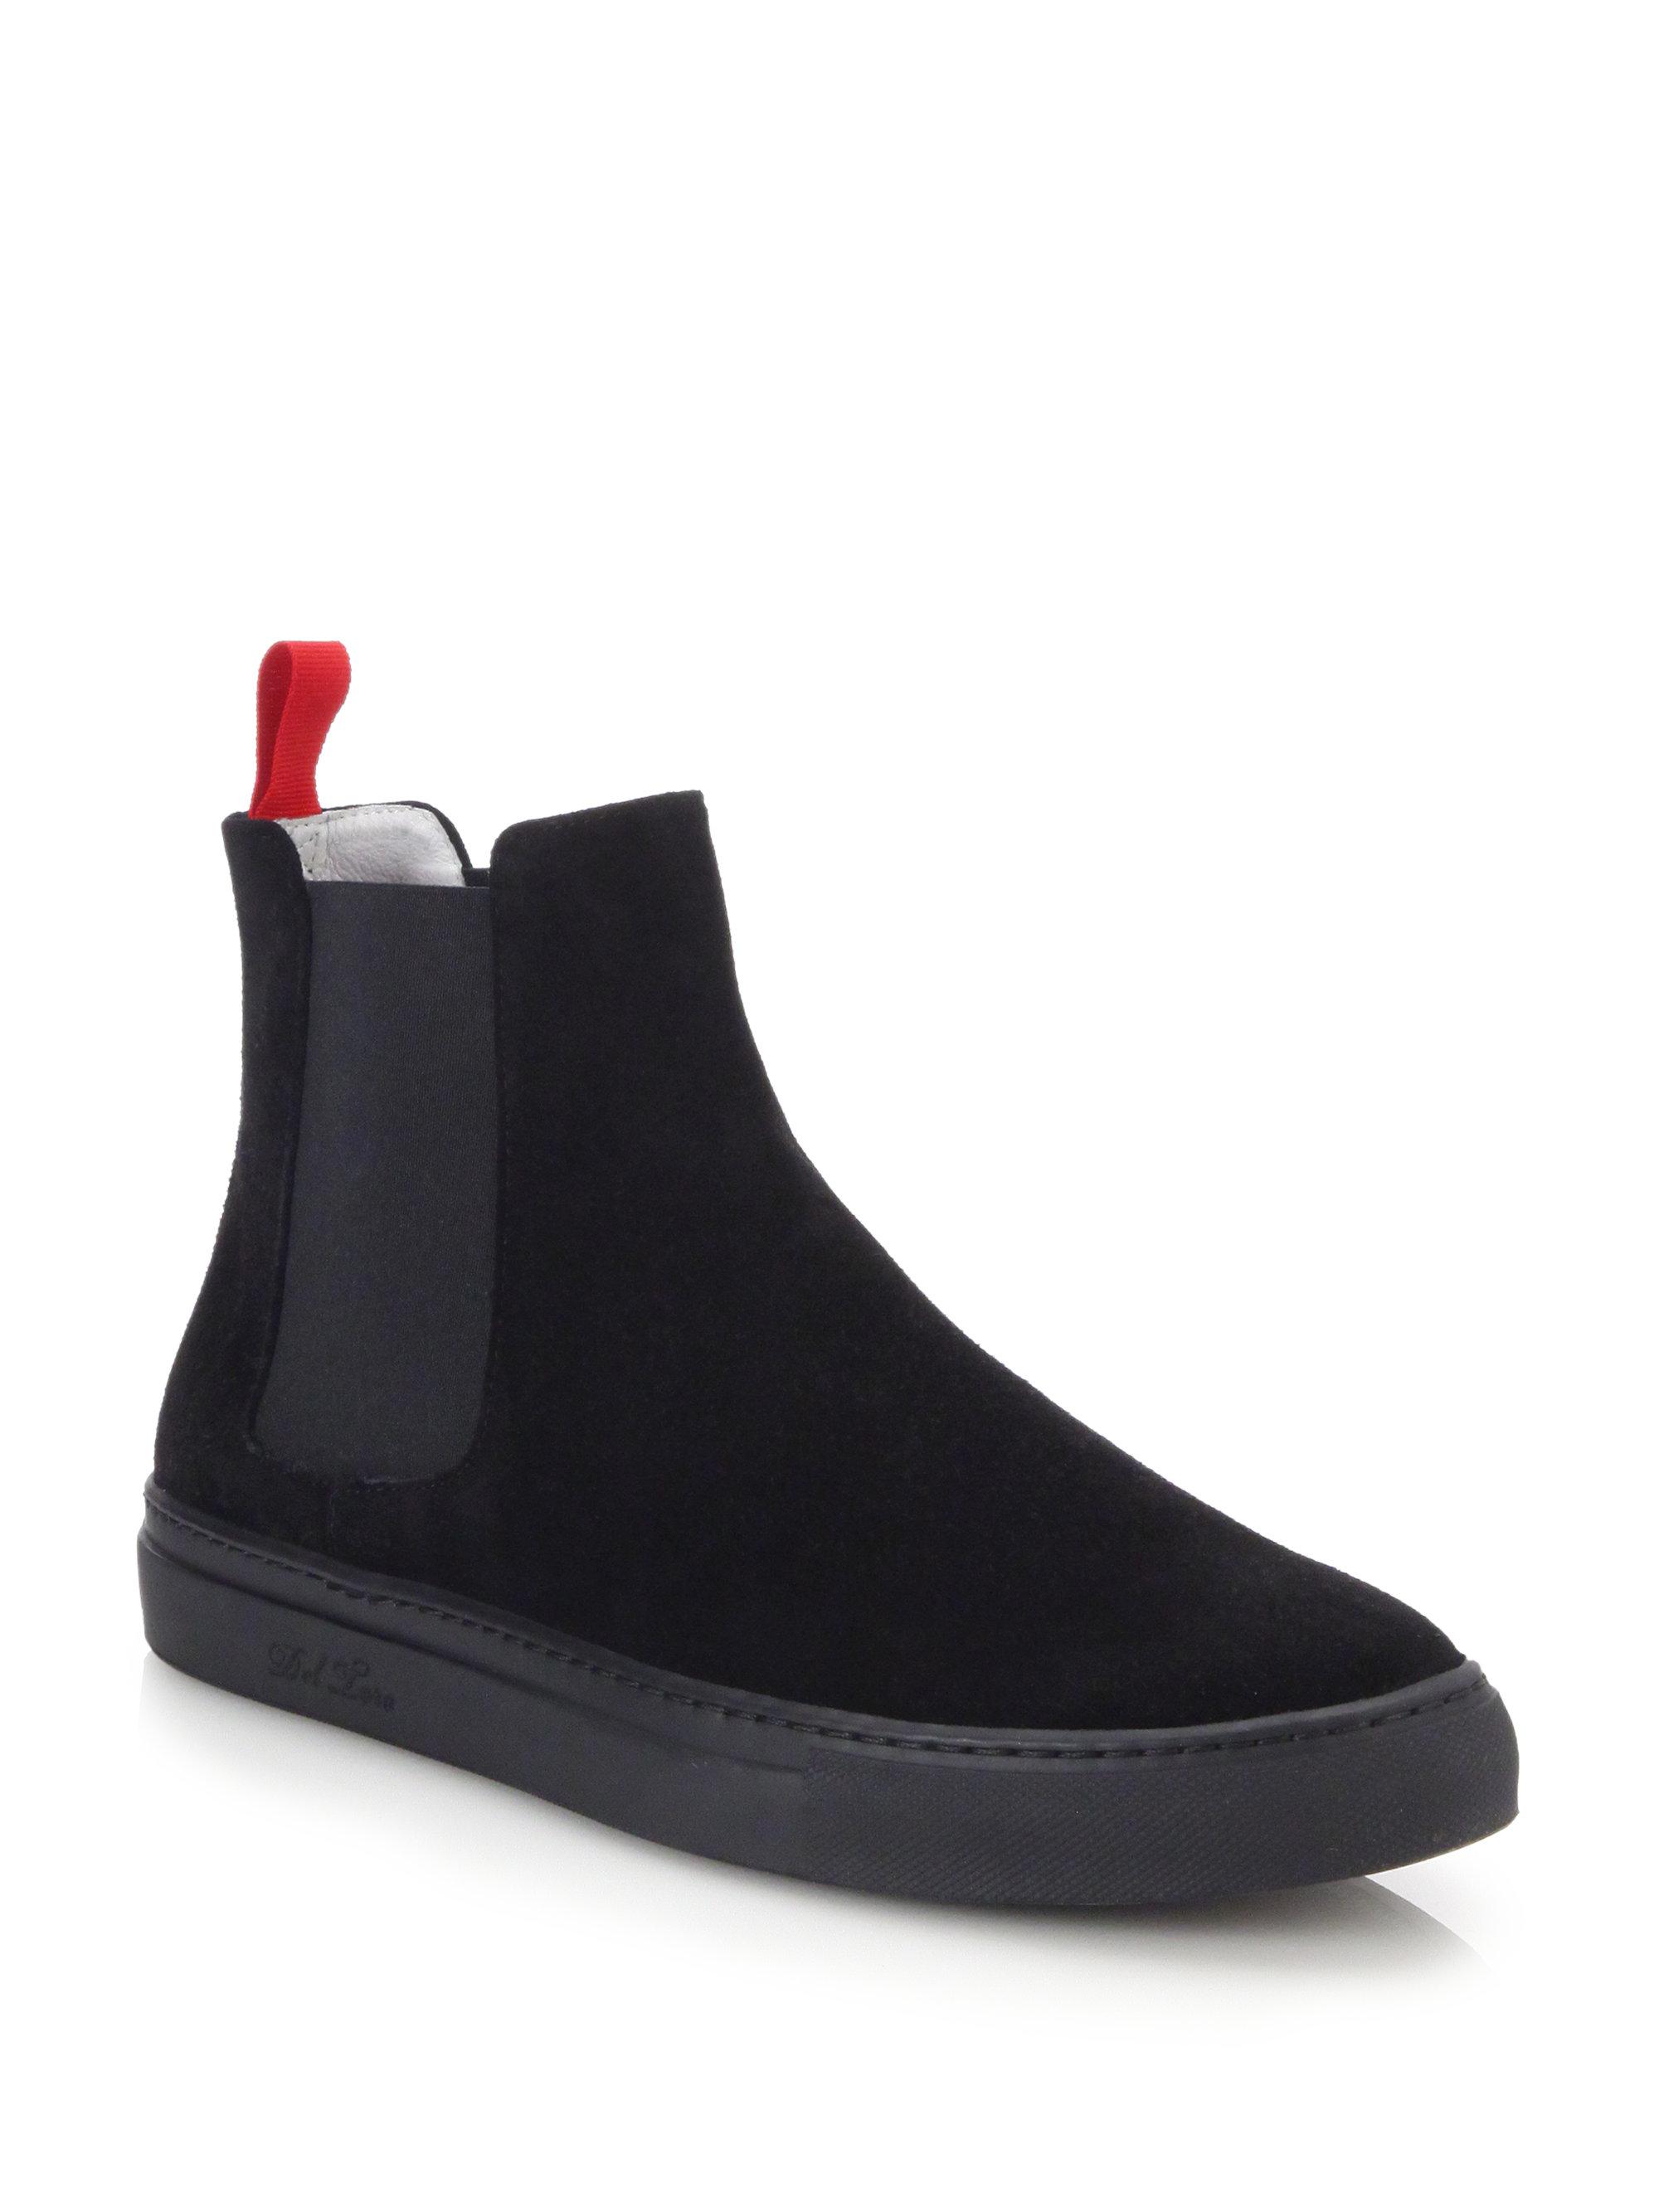 toro suede chelsea boot sneakers in black for lyst